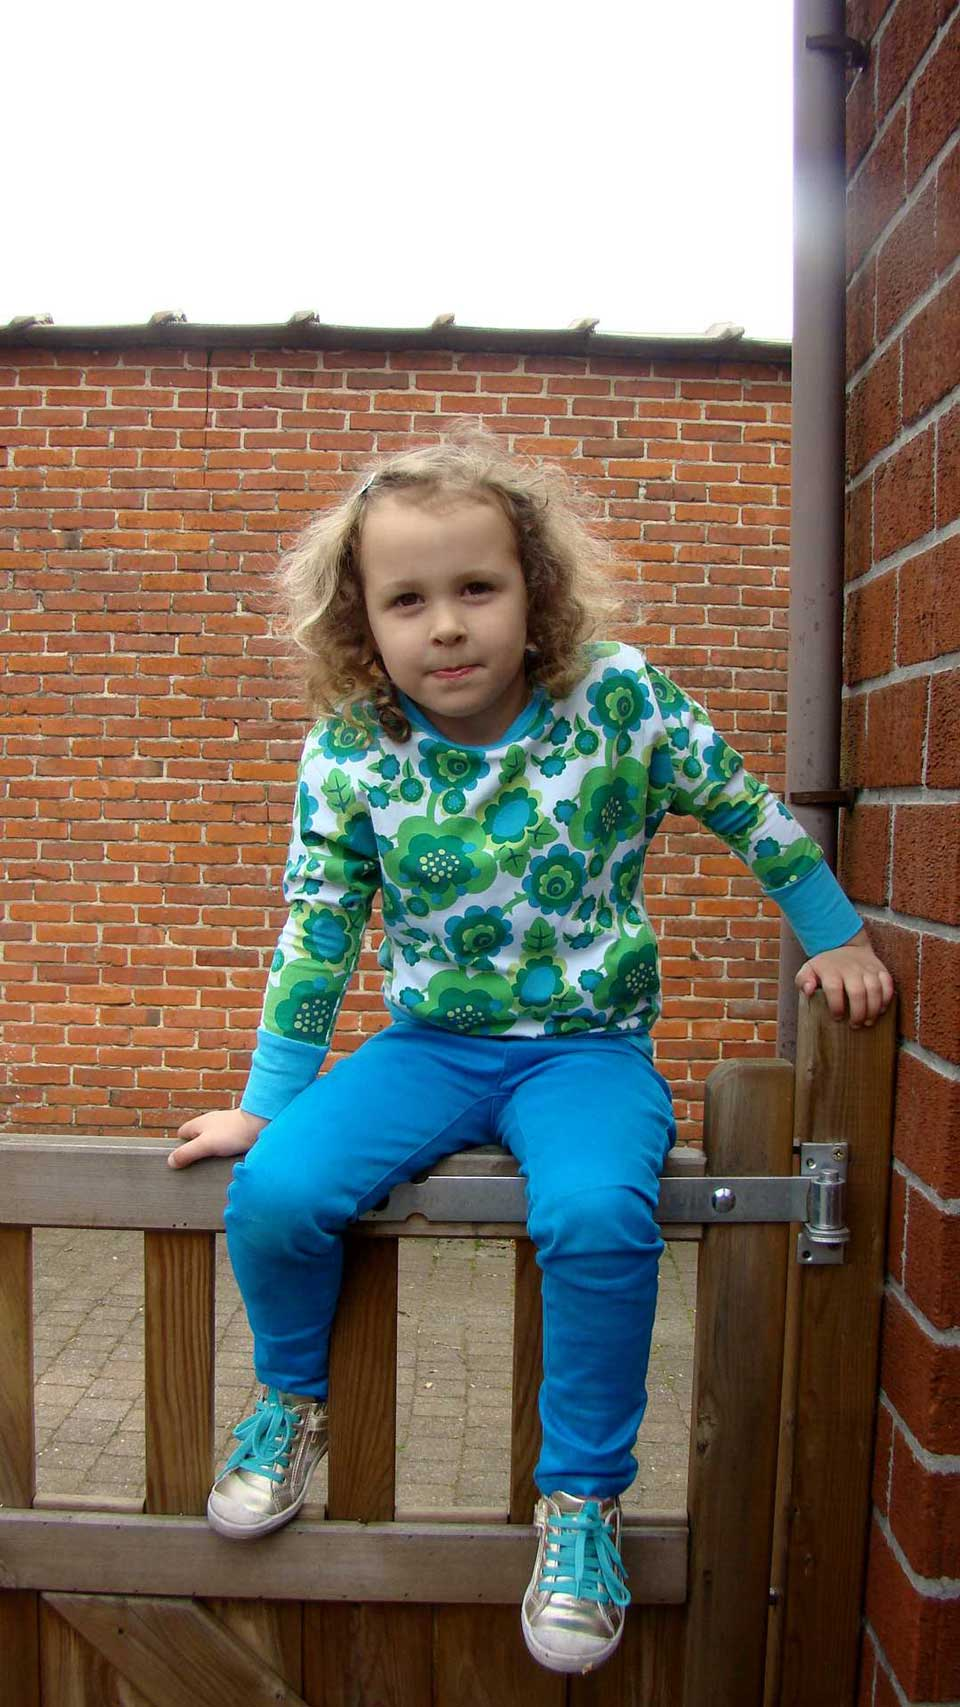 Compagnie-M_Julia-sweater_MiekeJansen_7